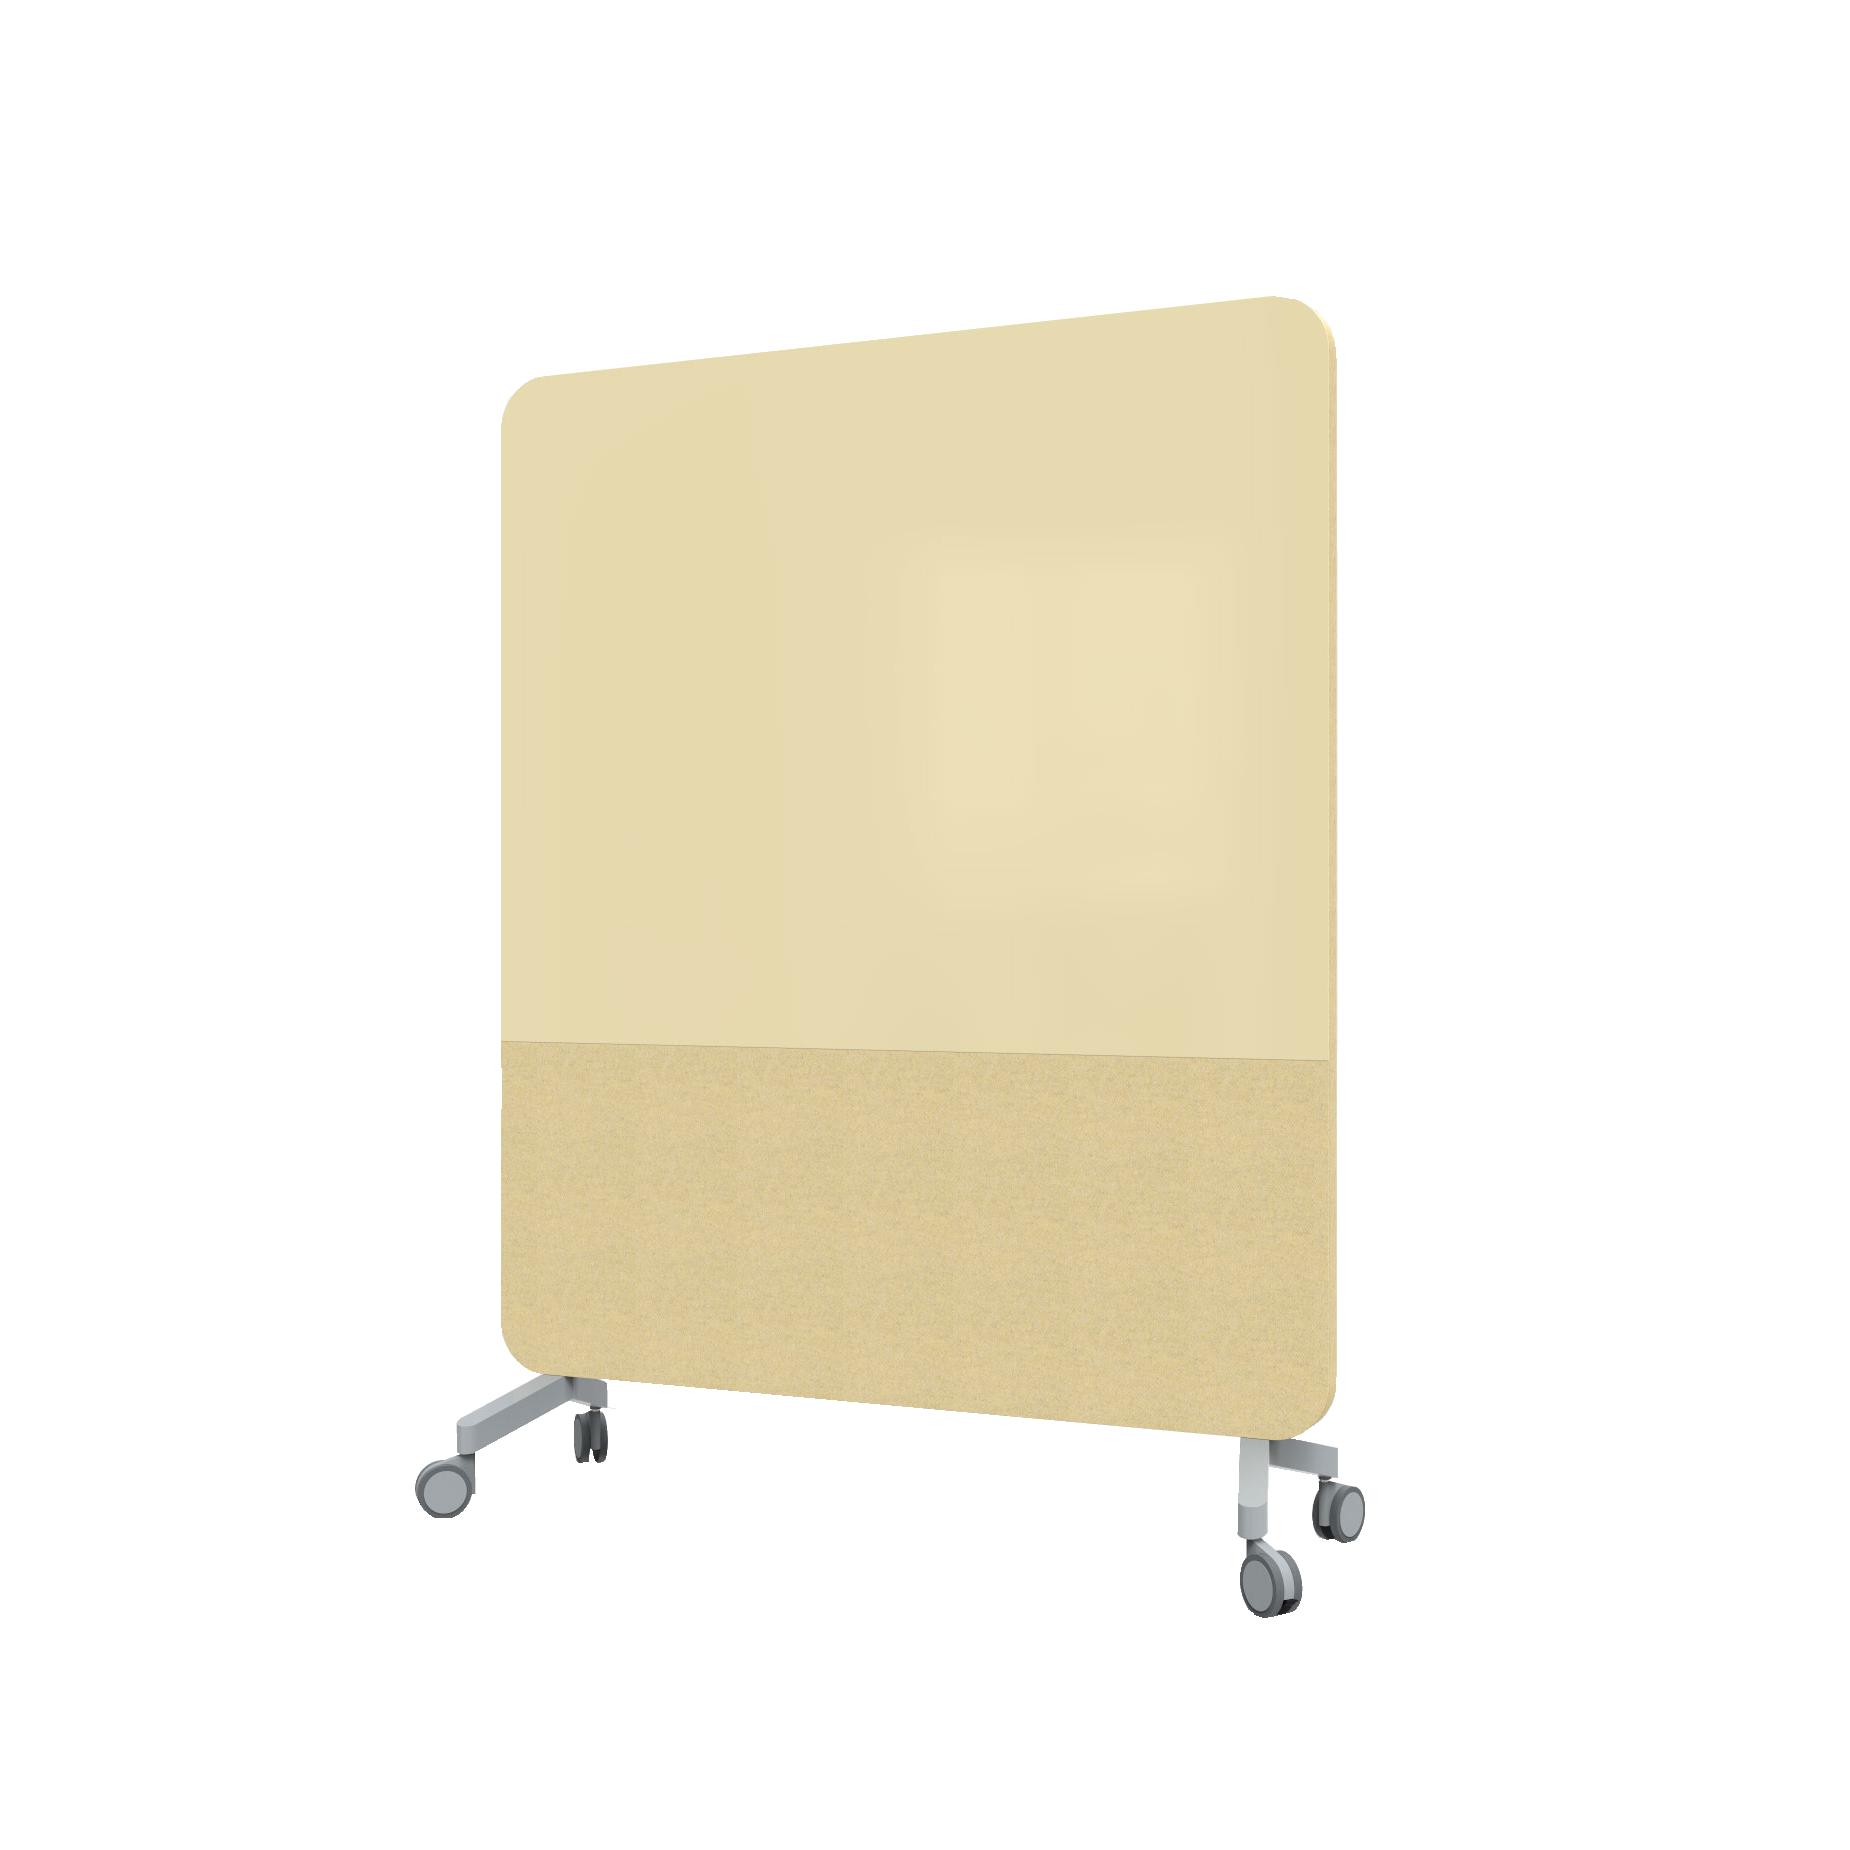 collab_screen_lintex_yellow